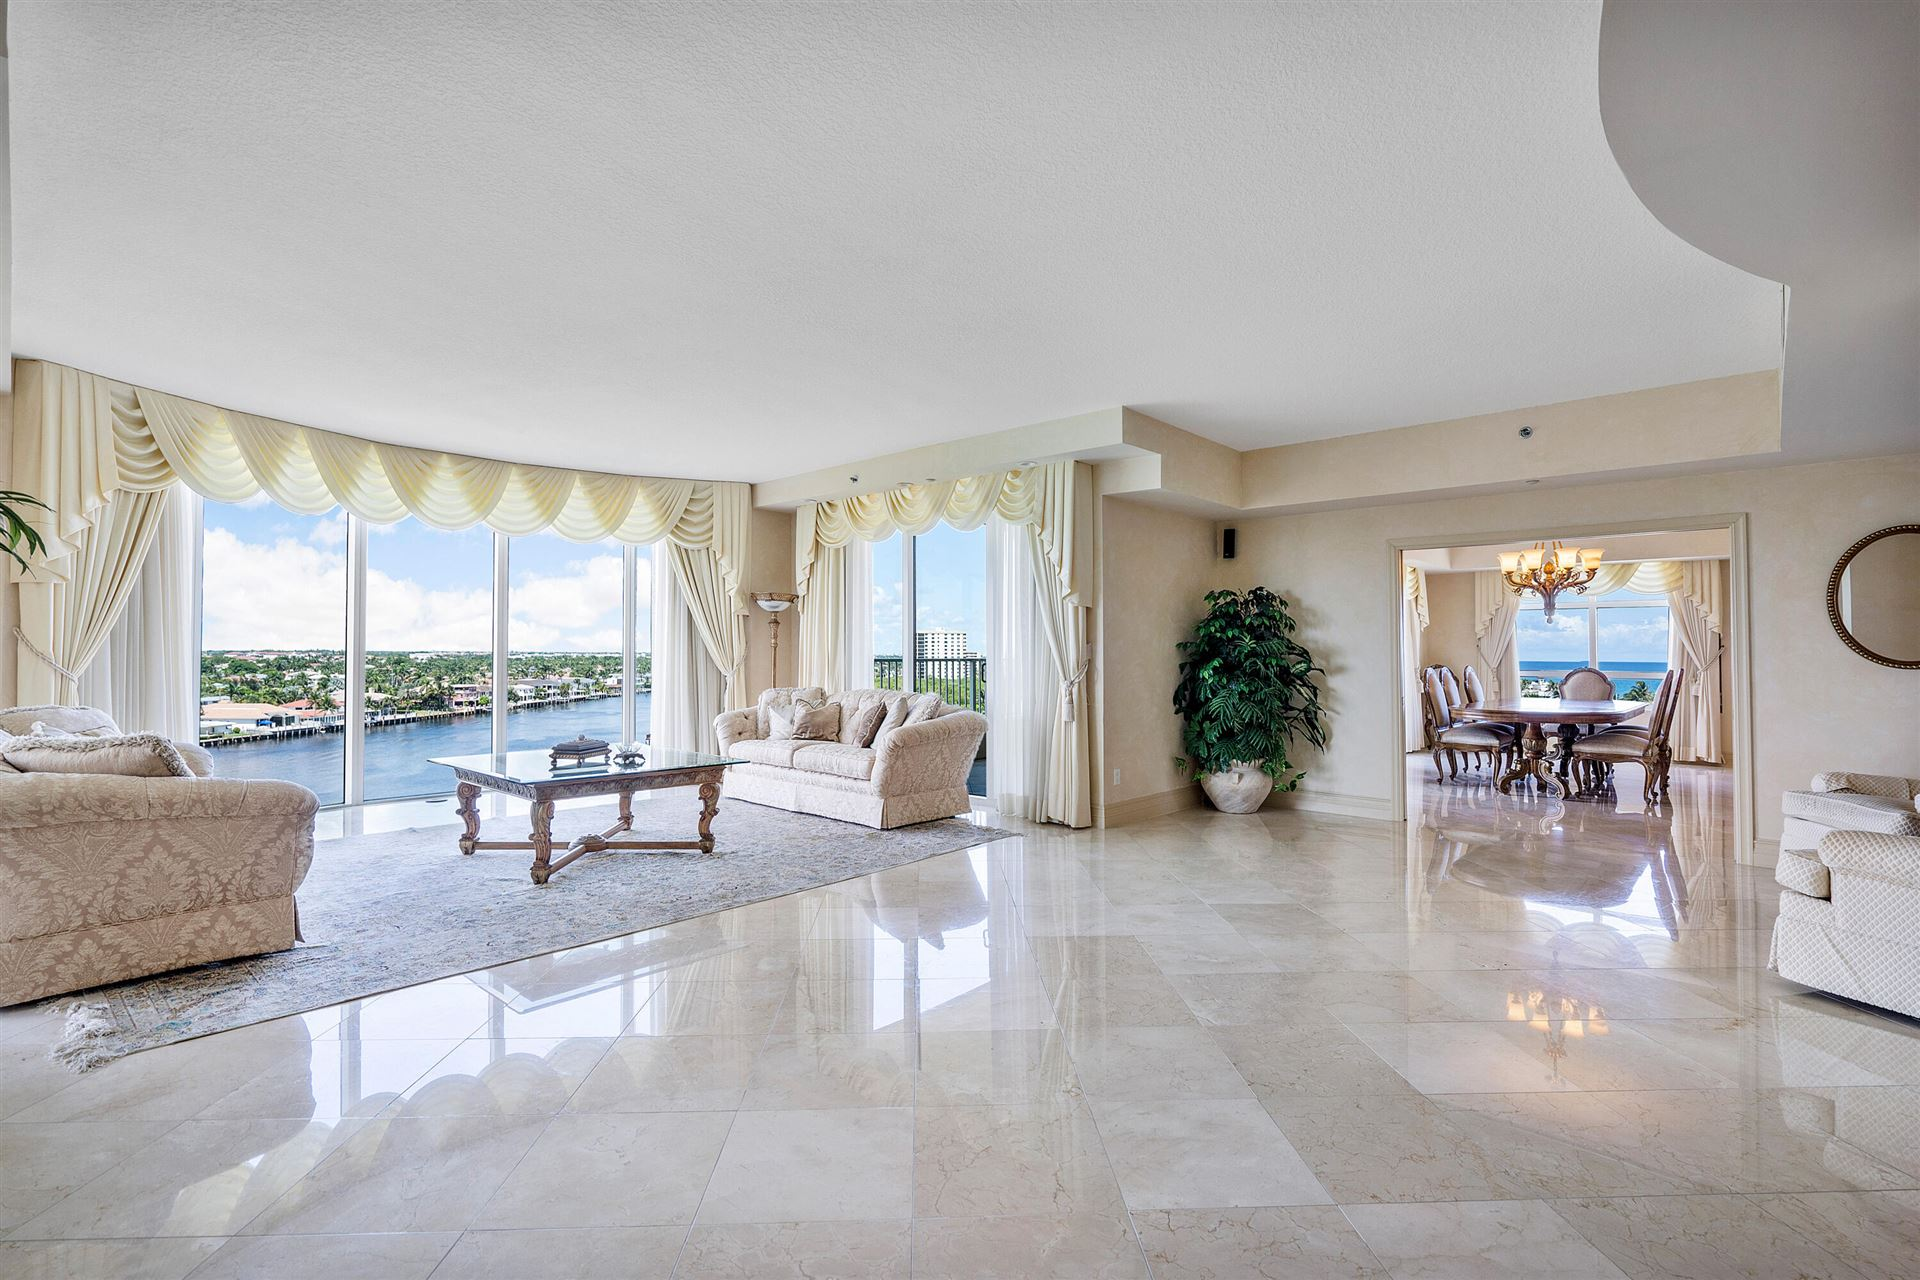 TOSCANA WEST CONDO Properties For Sale